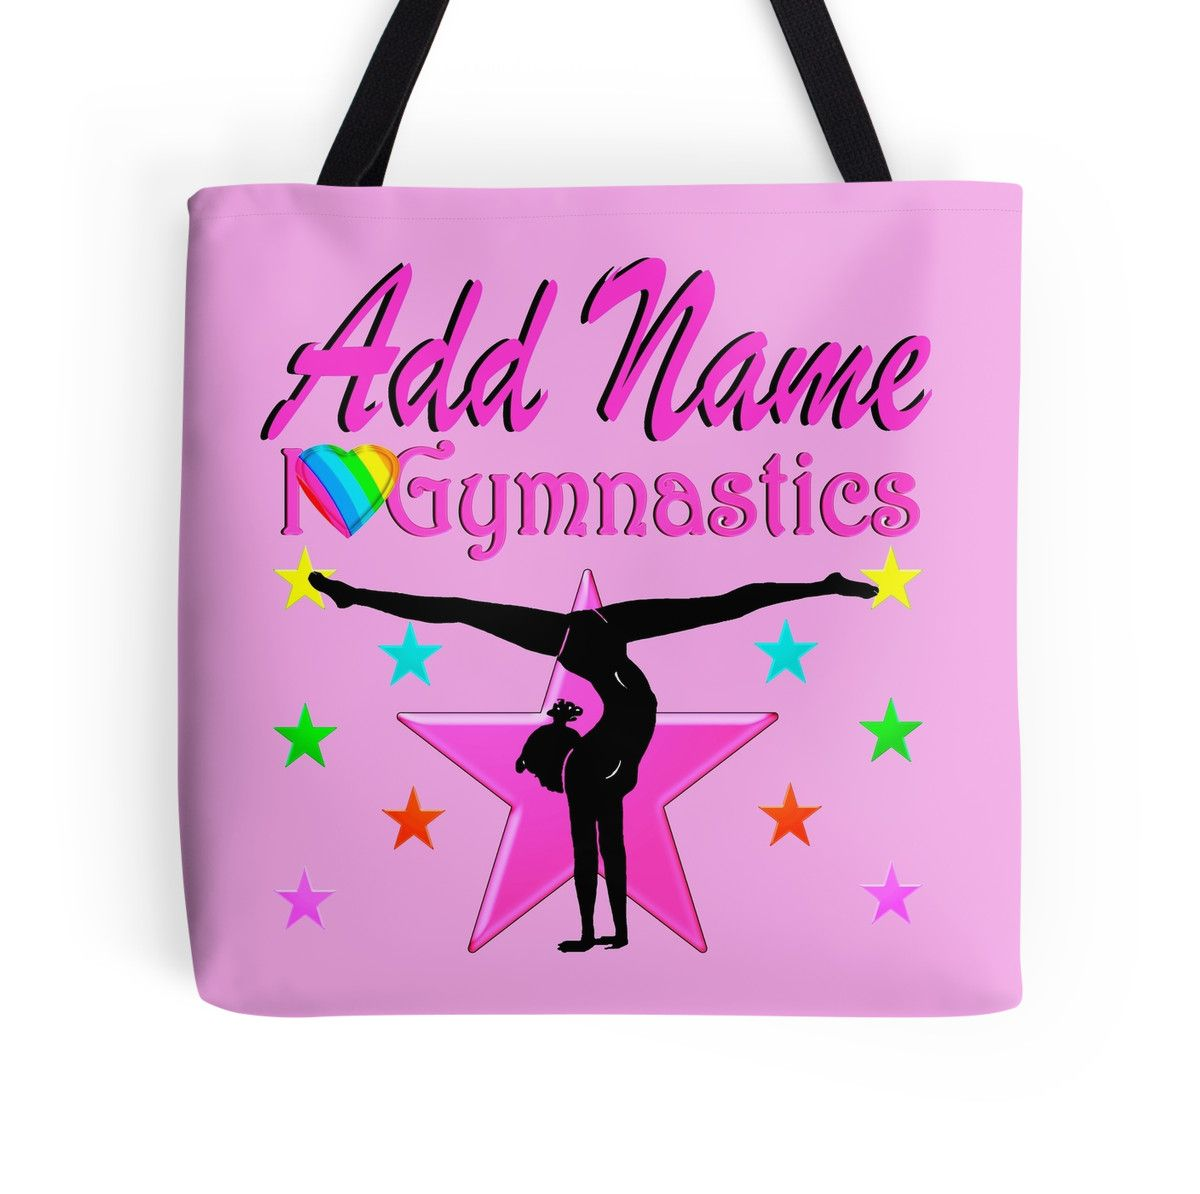 CUSTOM PINK I LOVE GYMNASTICS DESIGN by JLPOriginals http://www.redbubble.com/people/jlporiginals/works/15159258-custom-pink-i-love-gymnastics-design?c=360221-gymnastics #Gymnast  #IloveGymnastics   #WomensGymnastics  #Gymnastgift #Gymnasticsgifts #Personalizedgymnast #Customgymnast #Gymnasticsideas #Gymnastics